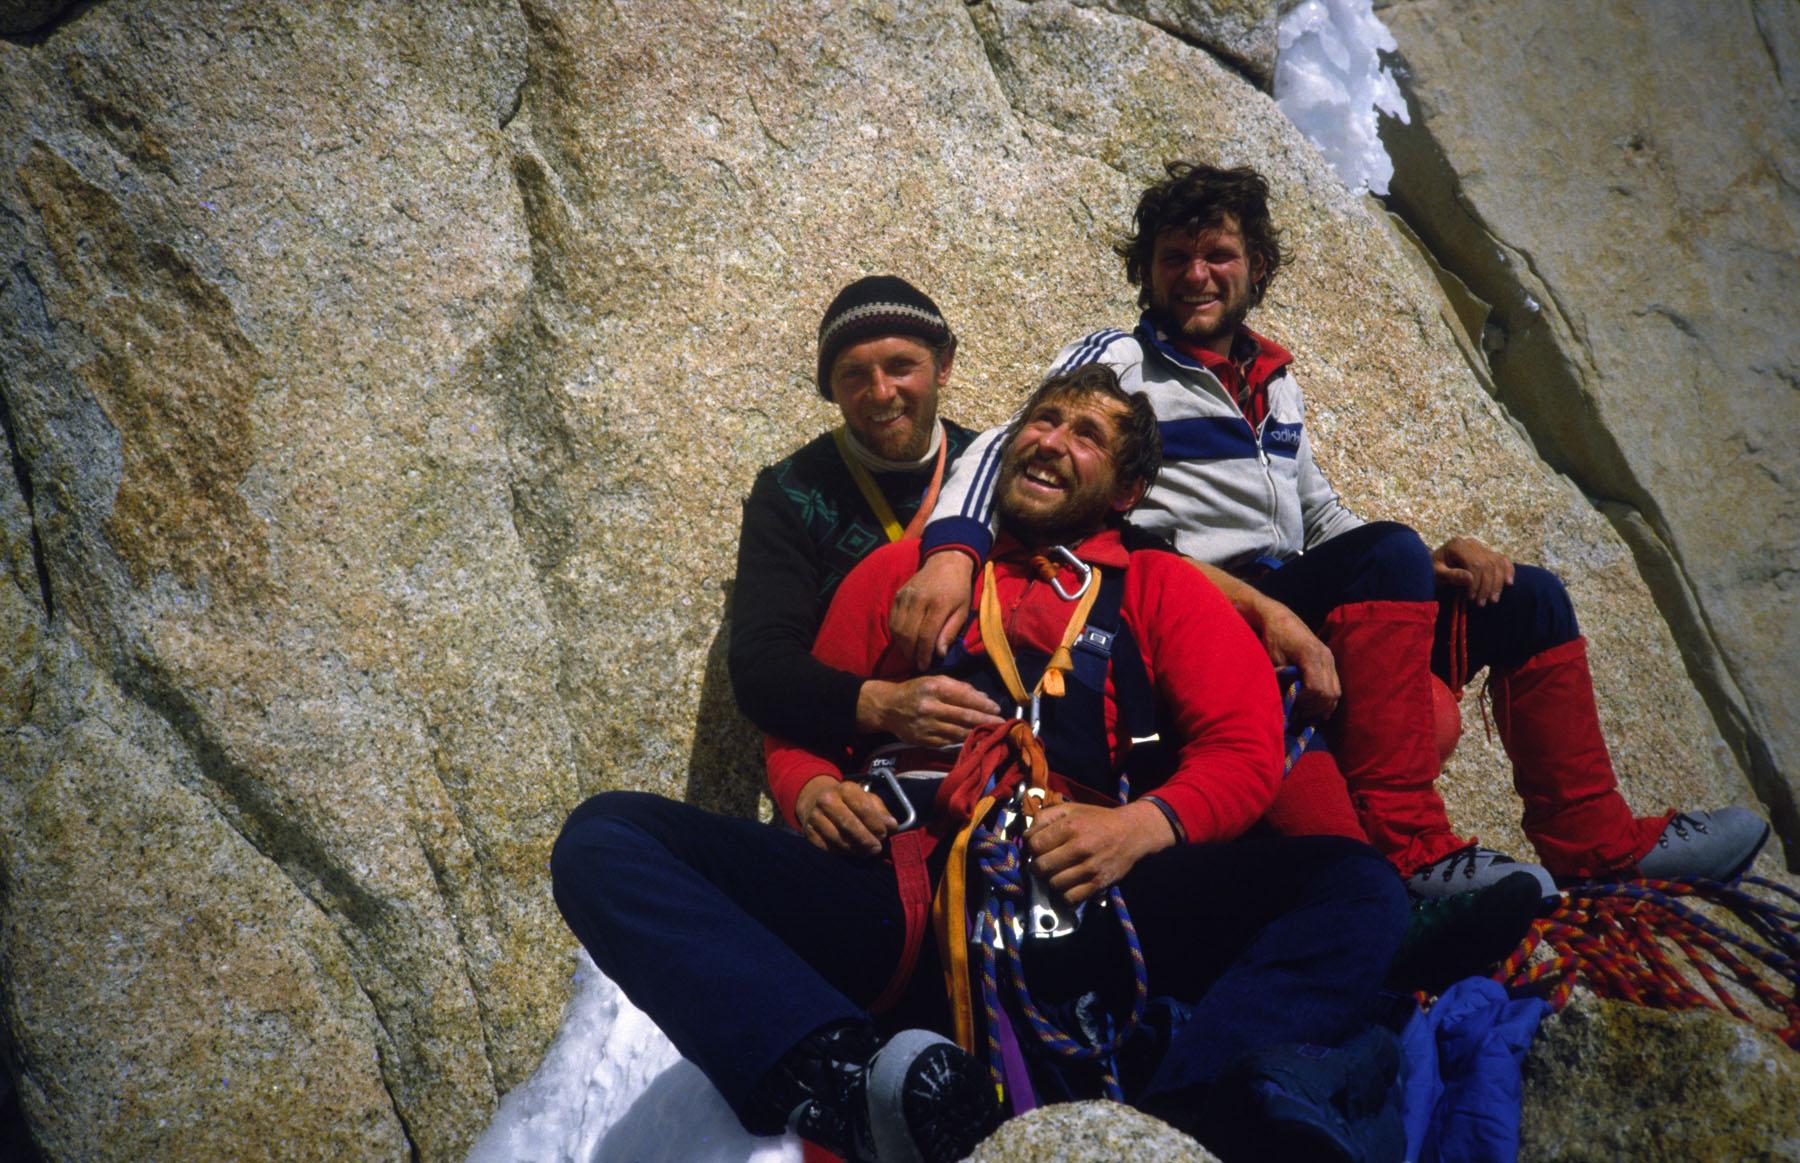 Photo archive©Silvo Karo_Francek Knez, Silvo Karo and Janez Jeglič on  Fitz Roy_december 1983